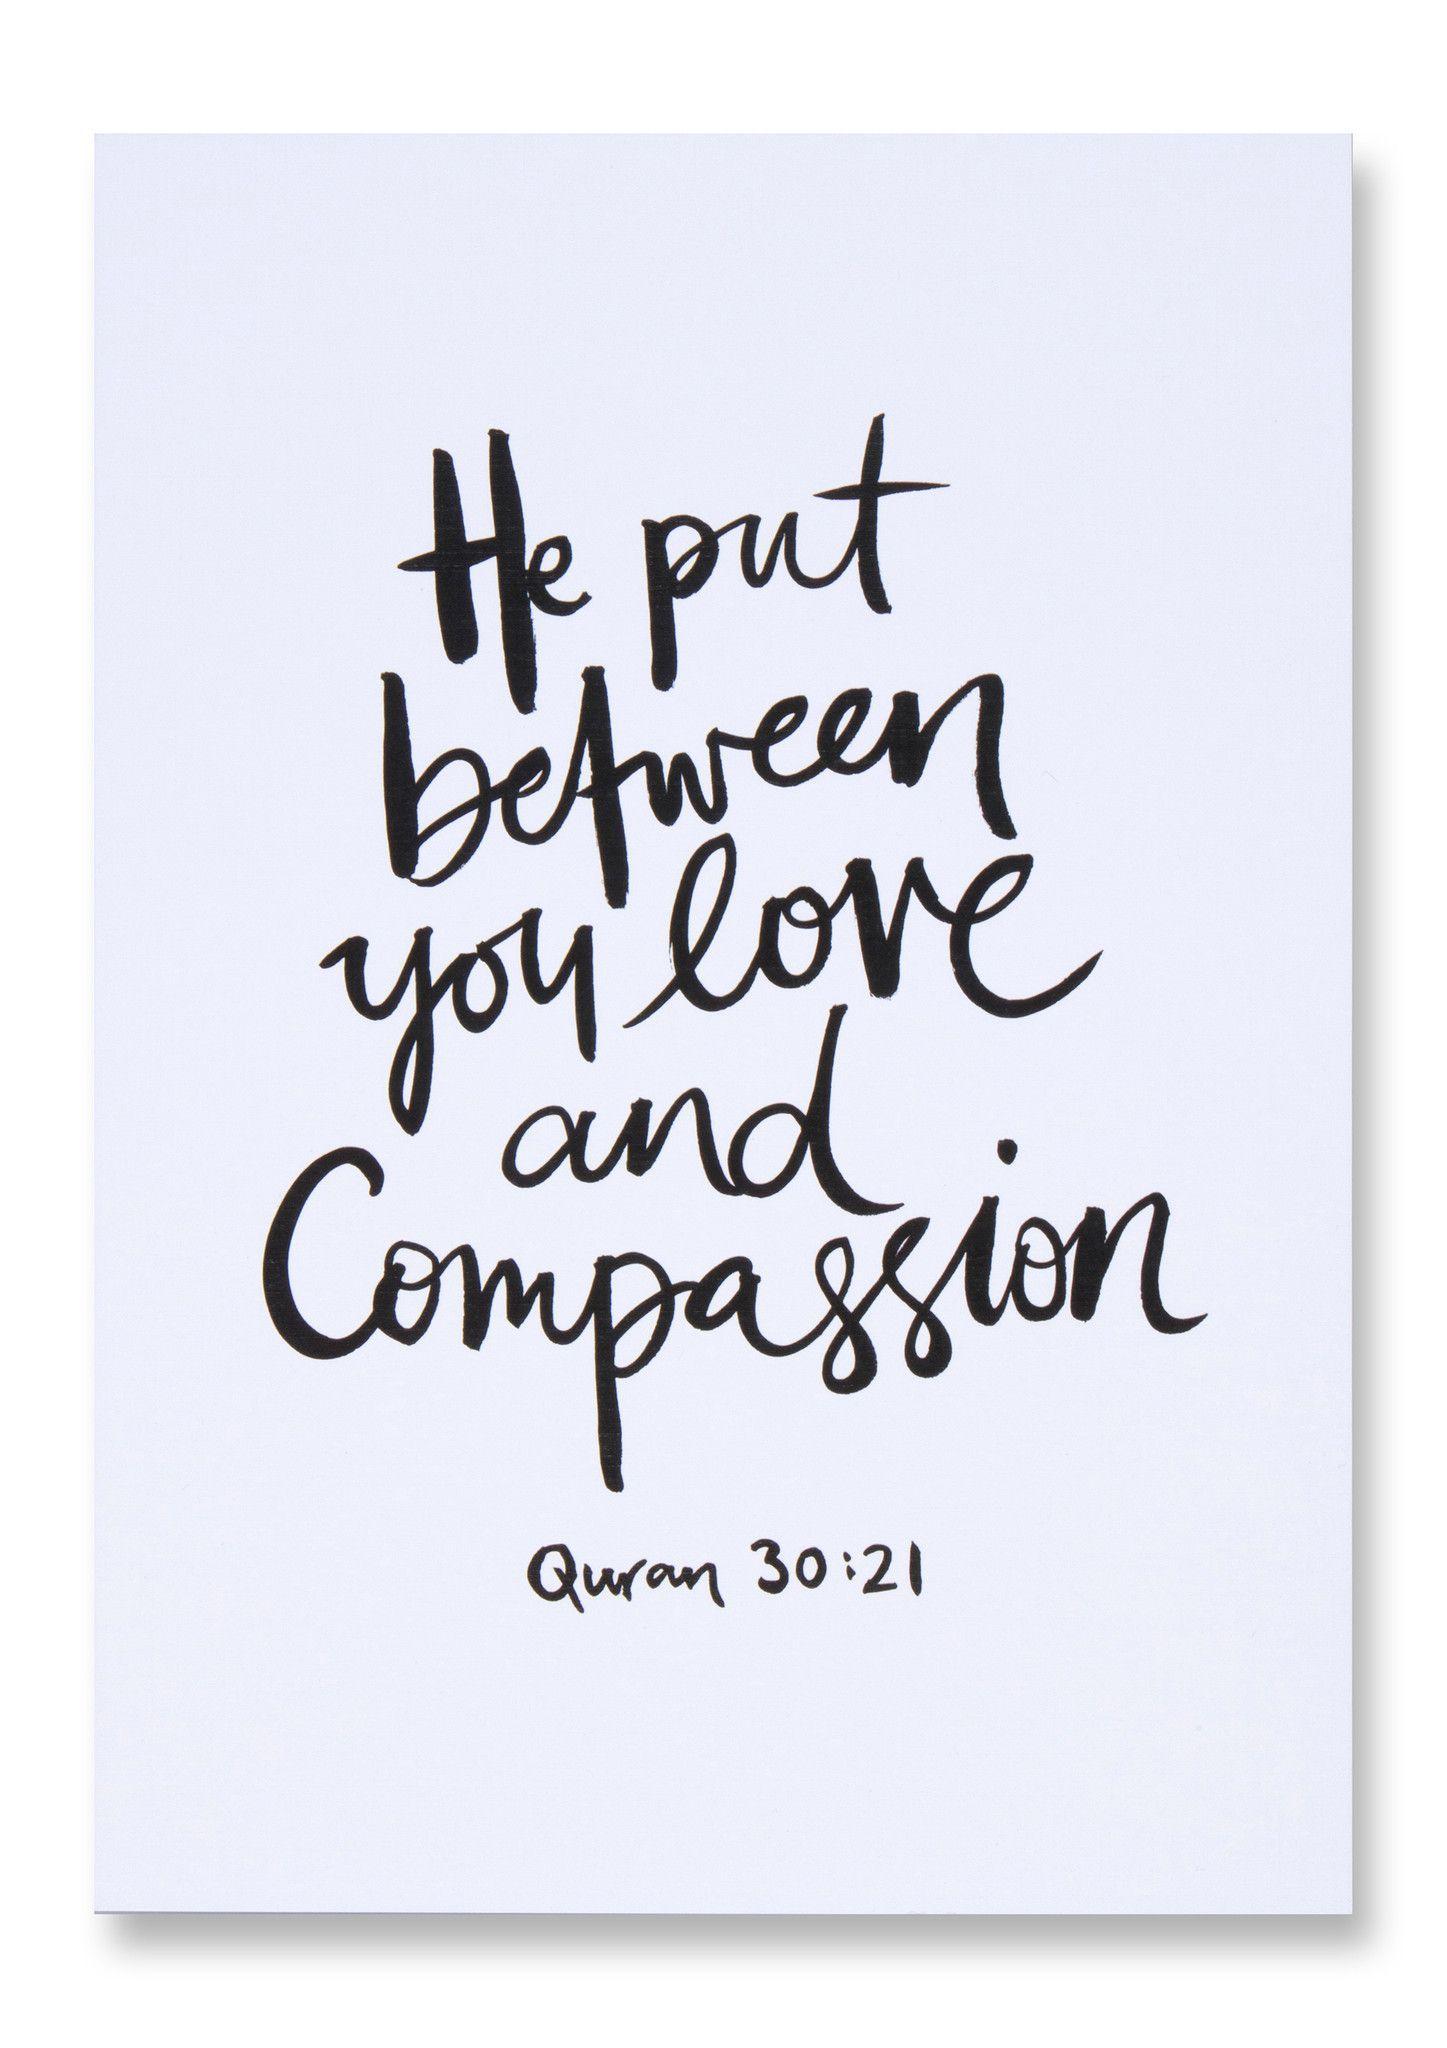 Citaten In Kunst : Love compassion islamic art print islam pinterest